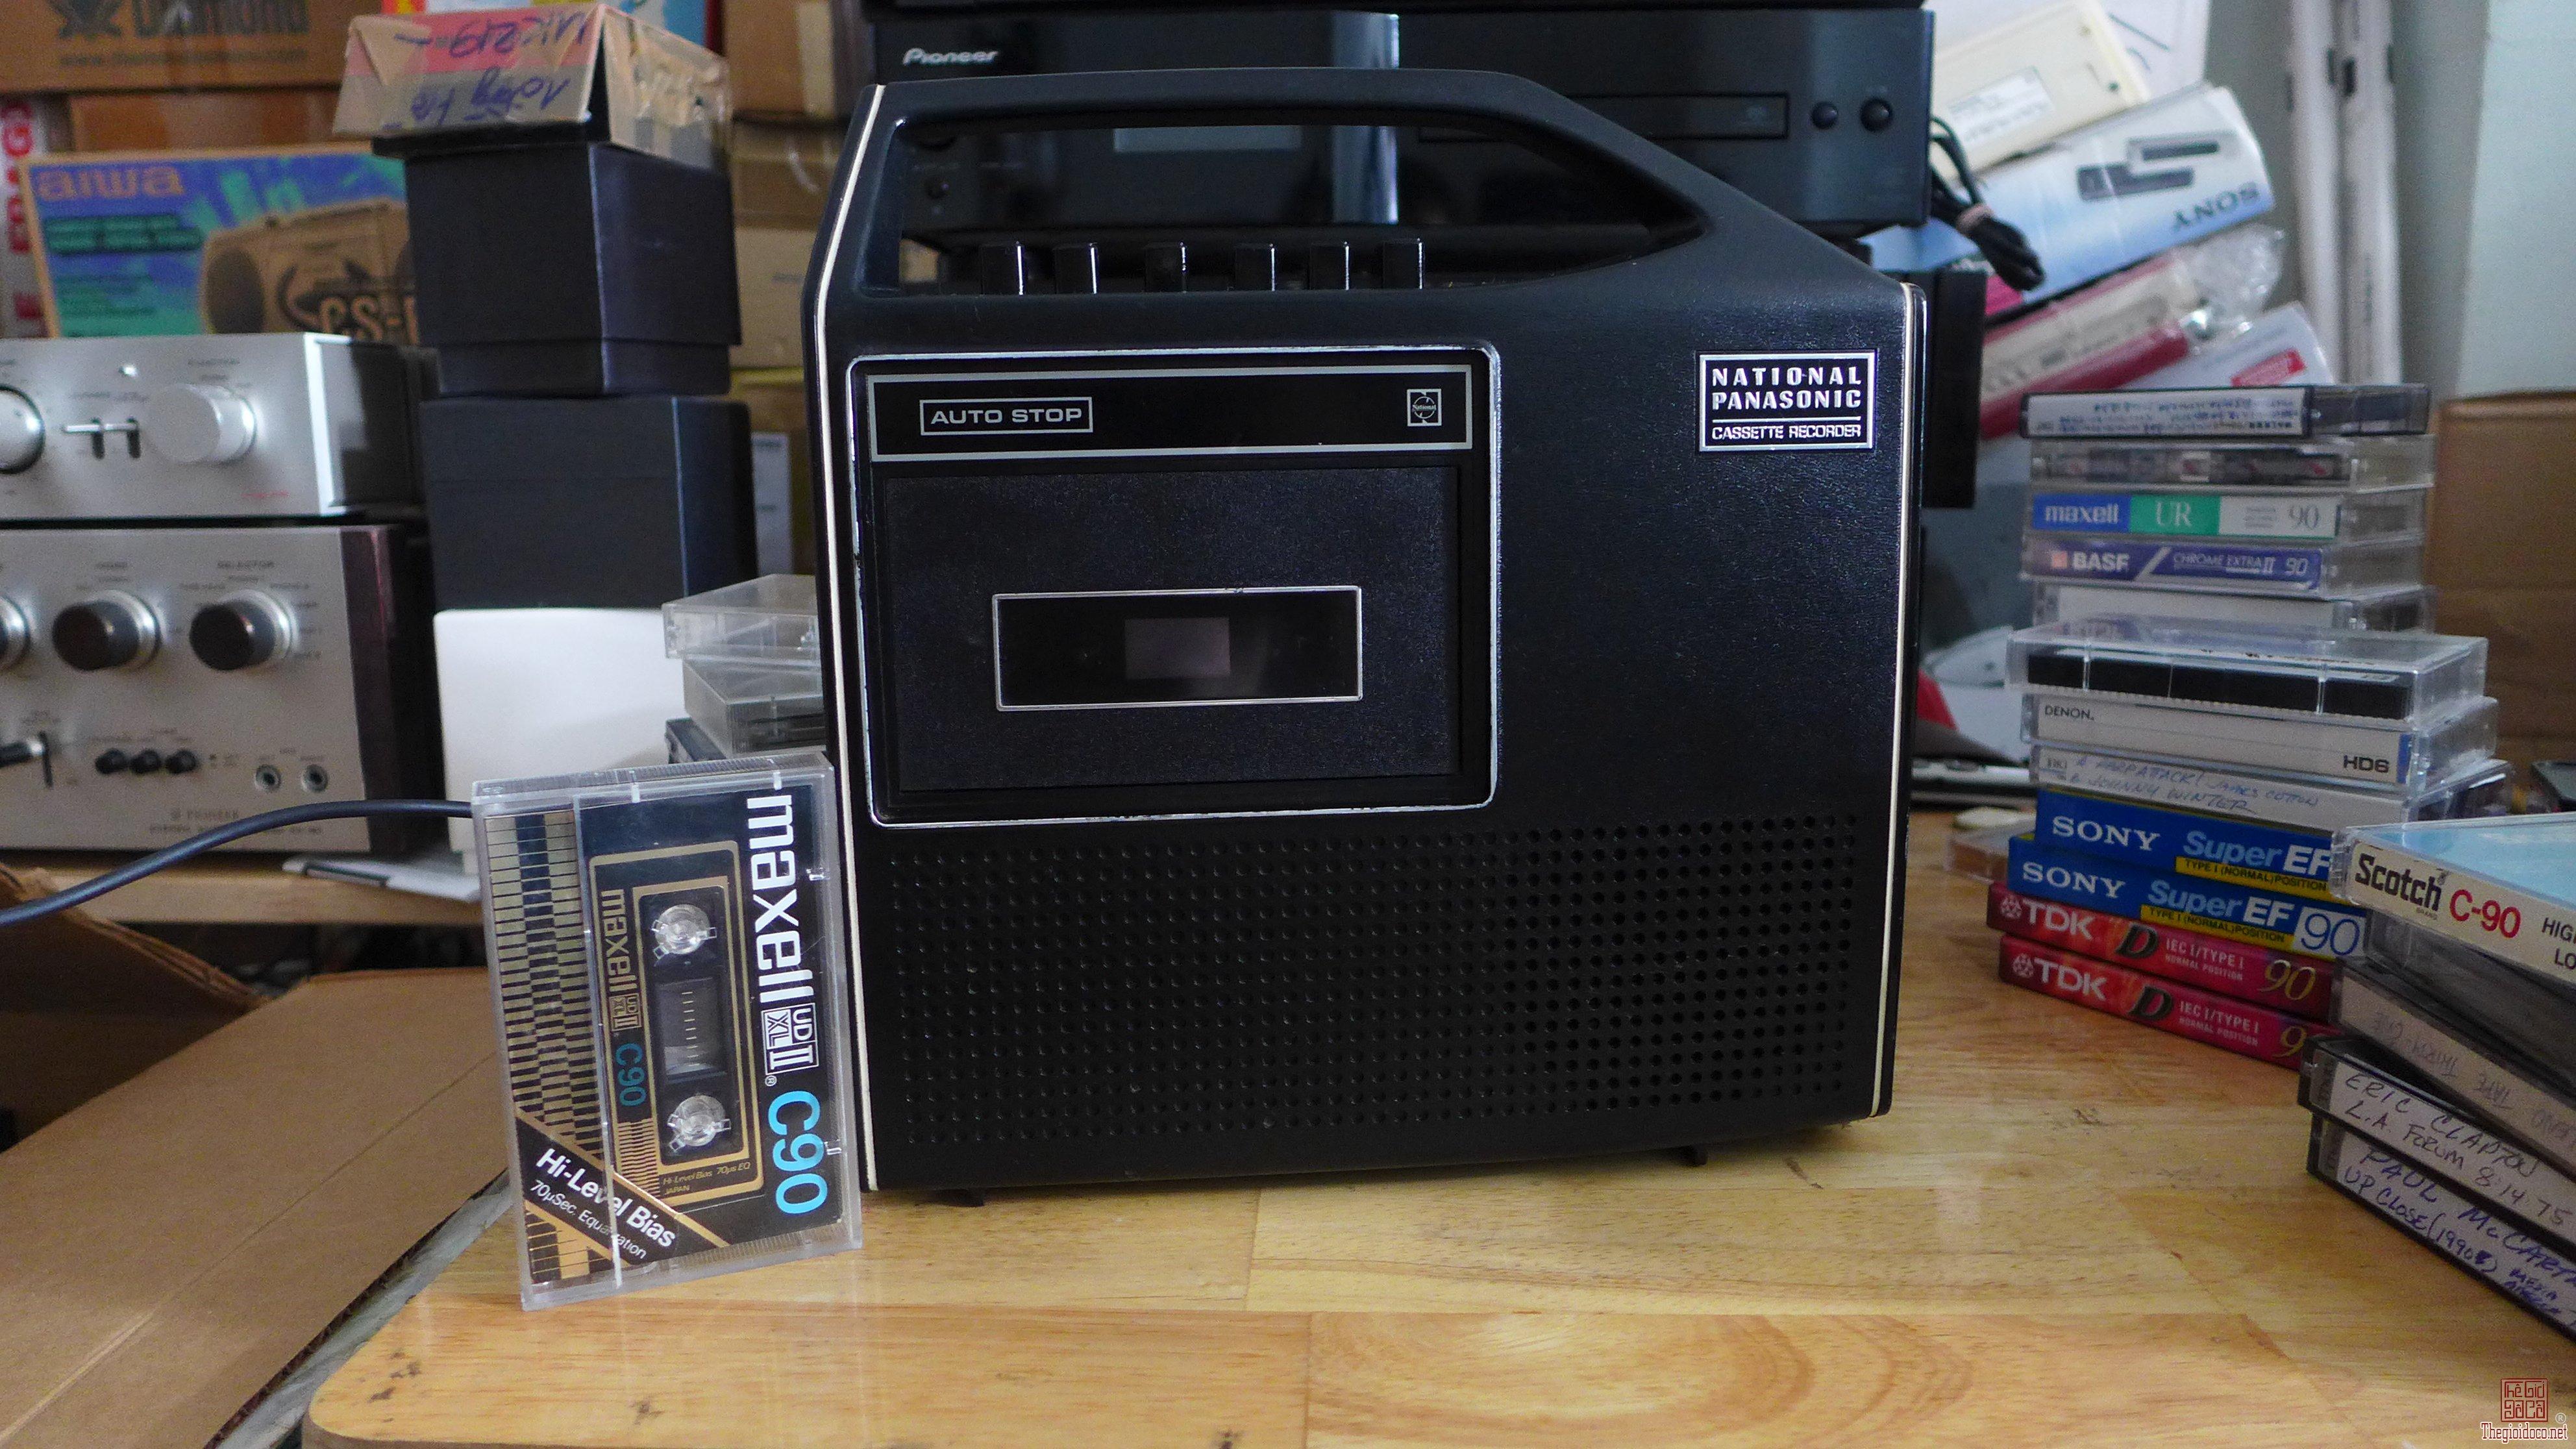 HCM - Q10 - Bán cassette Mono National Panasonic RQ-224S